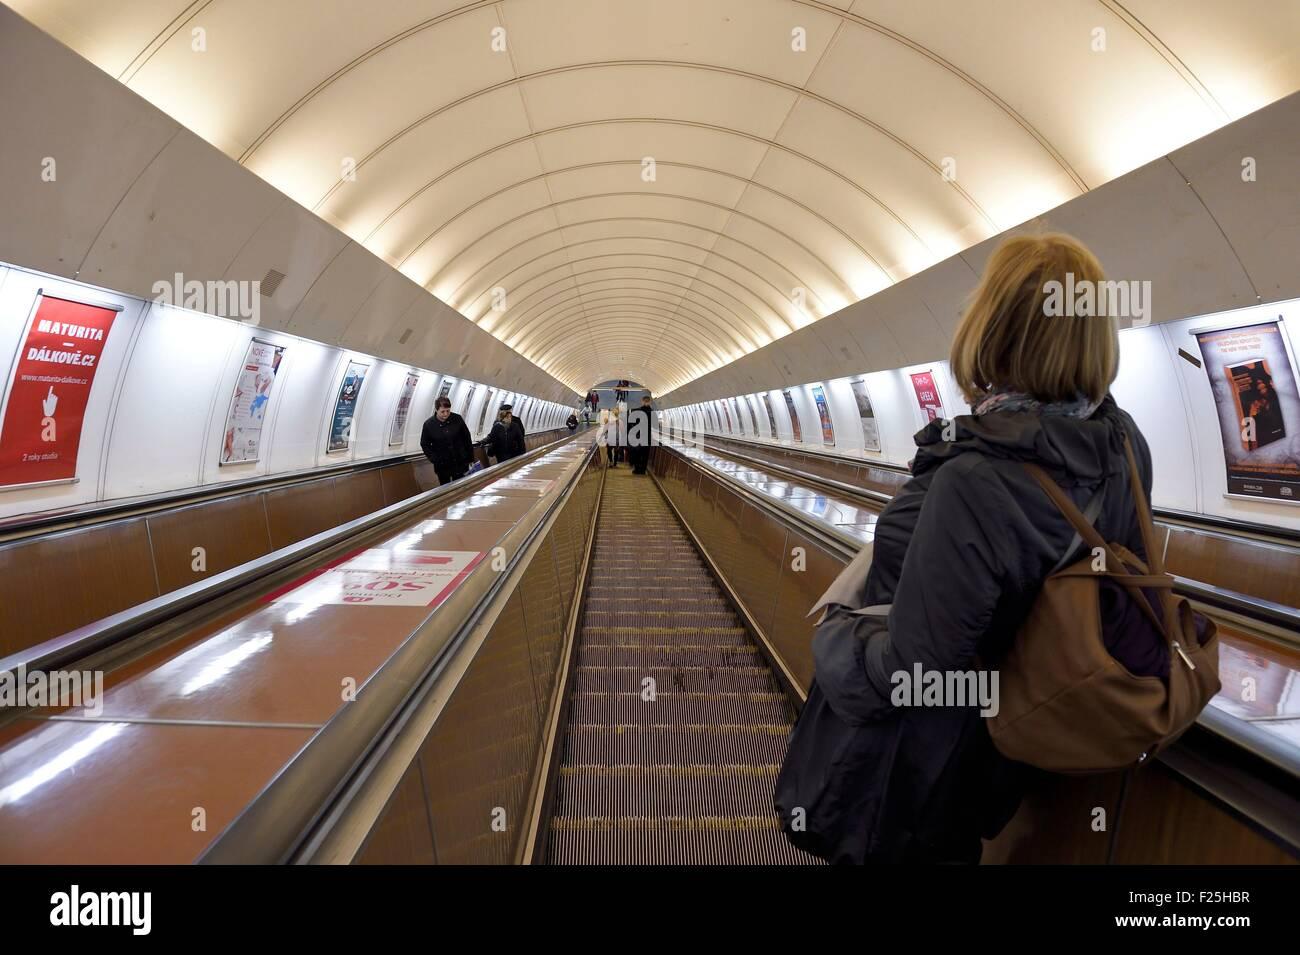 Czech Republic, Prague, escalator of the station Metro Nam Republiky - Stock Image